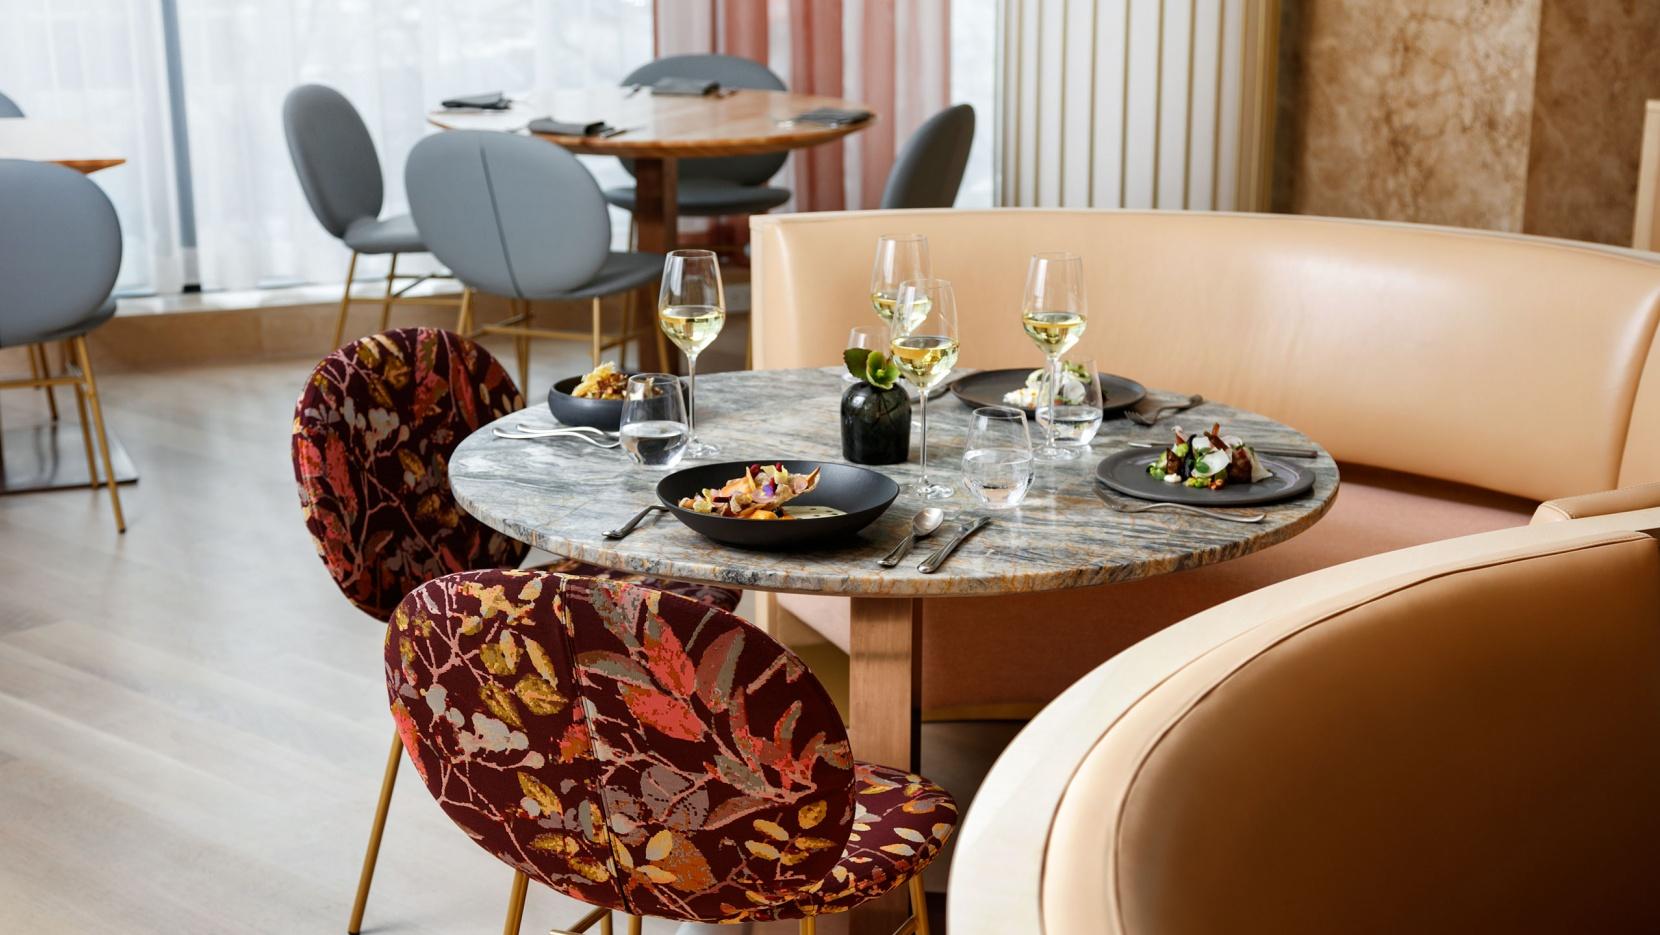 A Mid-Century Modern Restaurant with A Botanical Inspiration 1